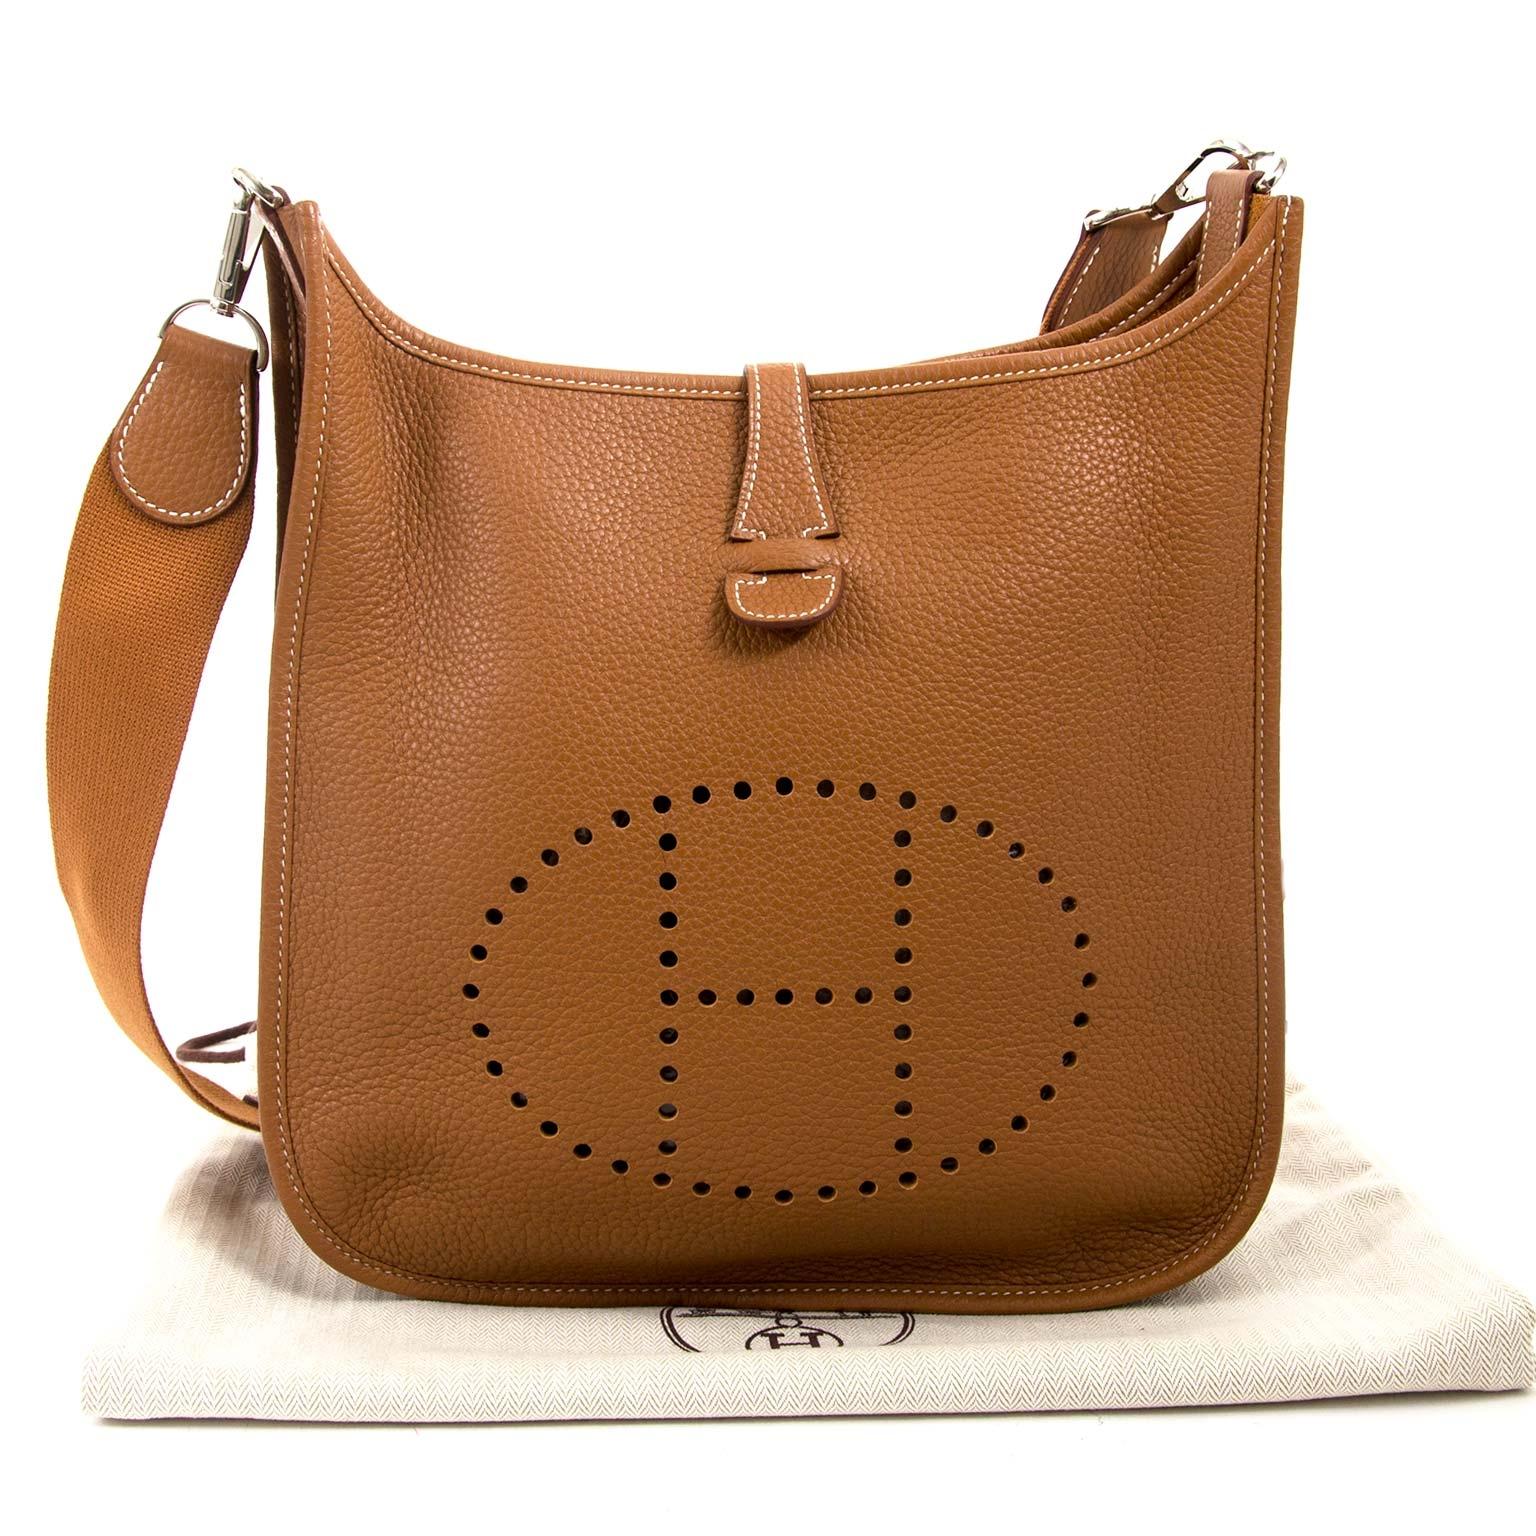 28785cf3df0 ... koop jou tweedehands Hermes Gold Evelyne III PM Messenger Bag online